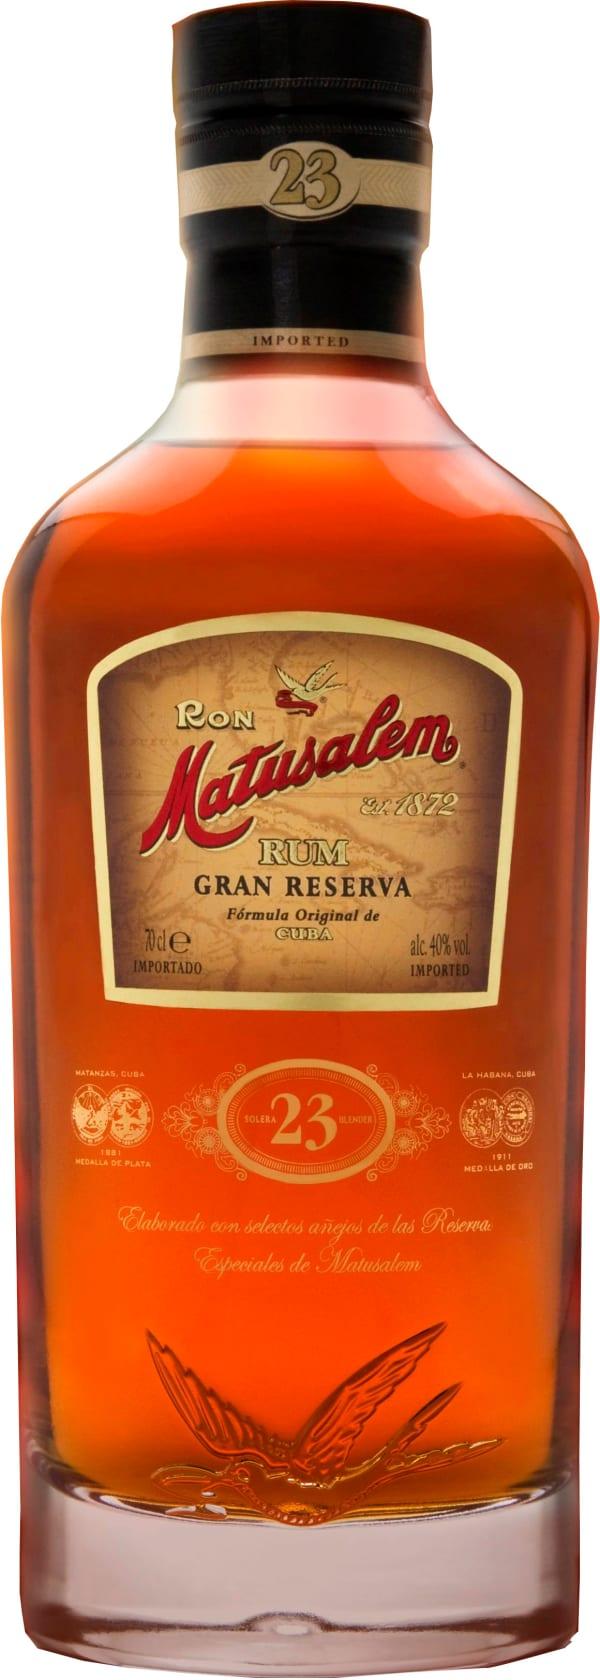 Ron Matusalem 23 Gran Reserva